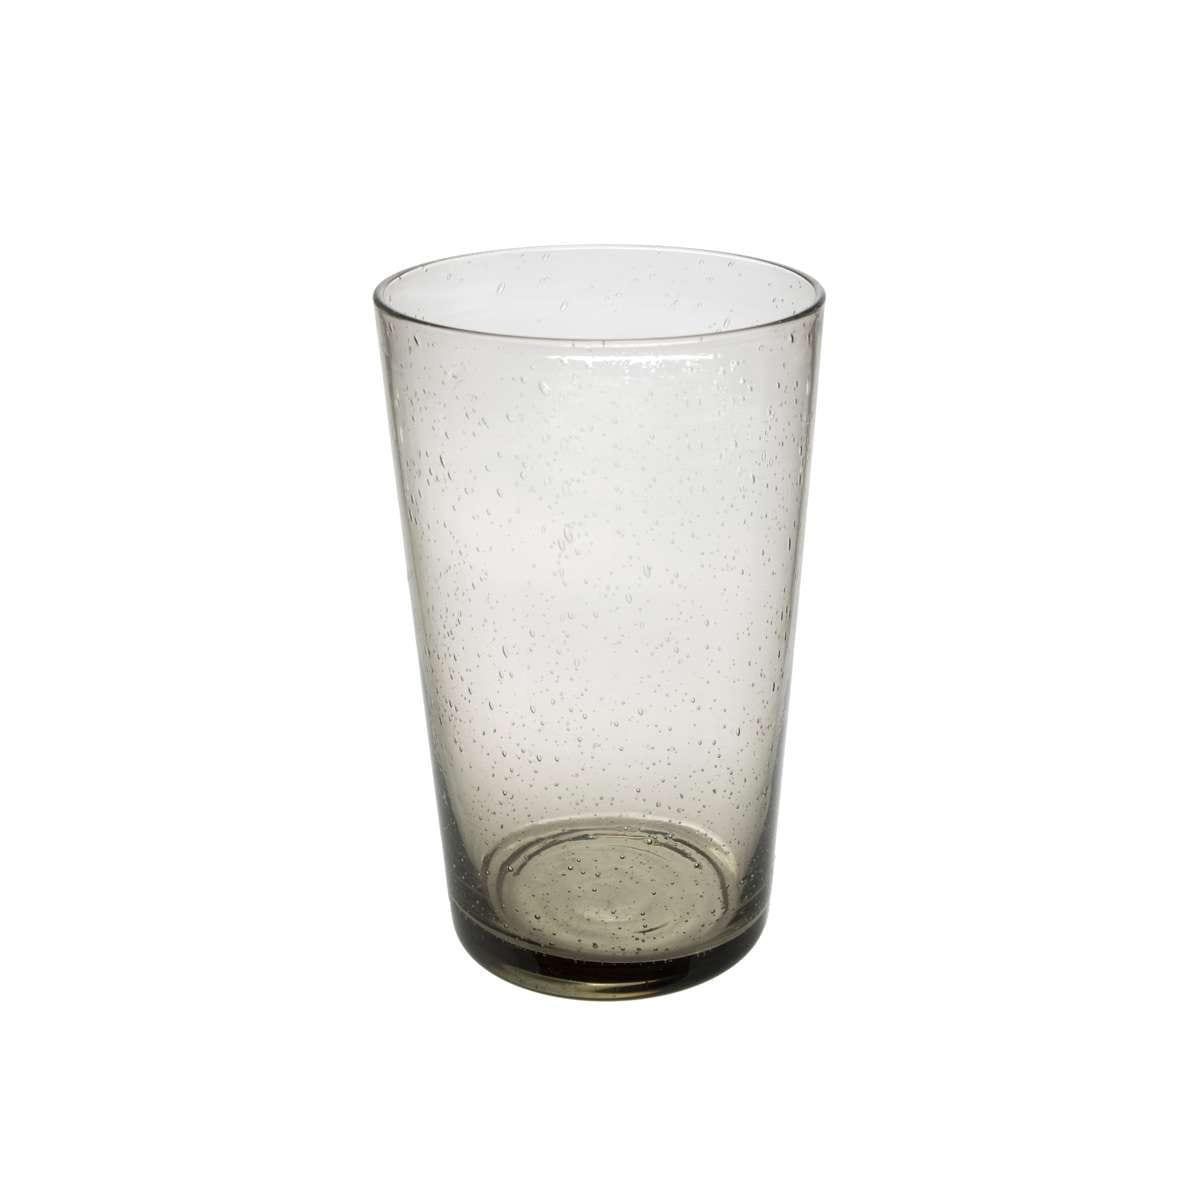 S/6 Ποτήρι νερού φυσητό Sunset γυάλινο γκρι φιμέ 480ml